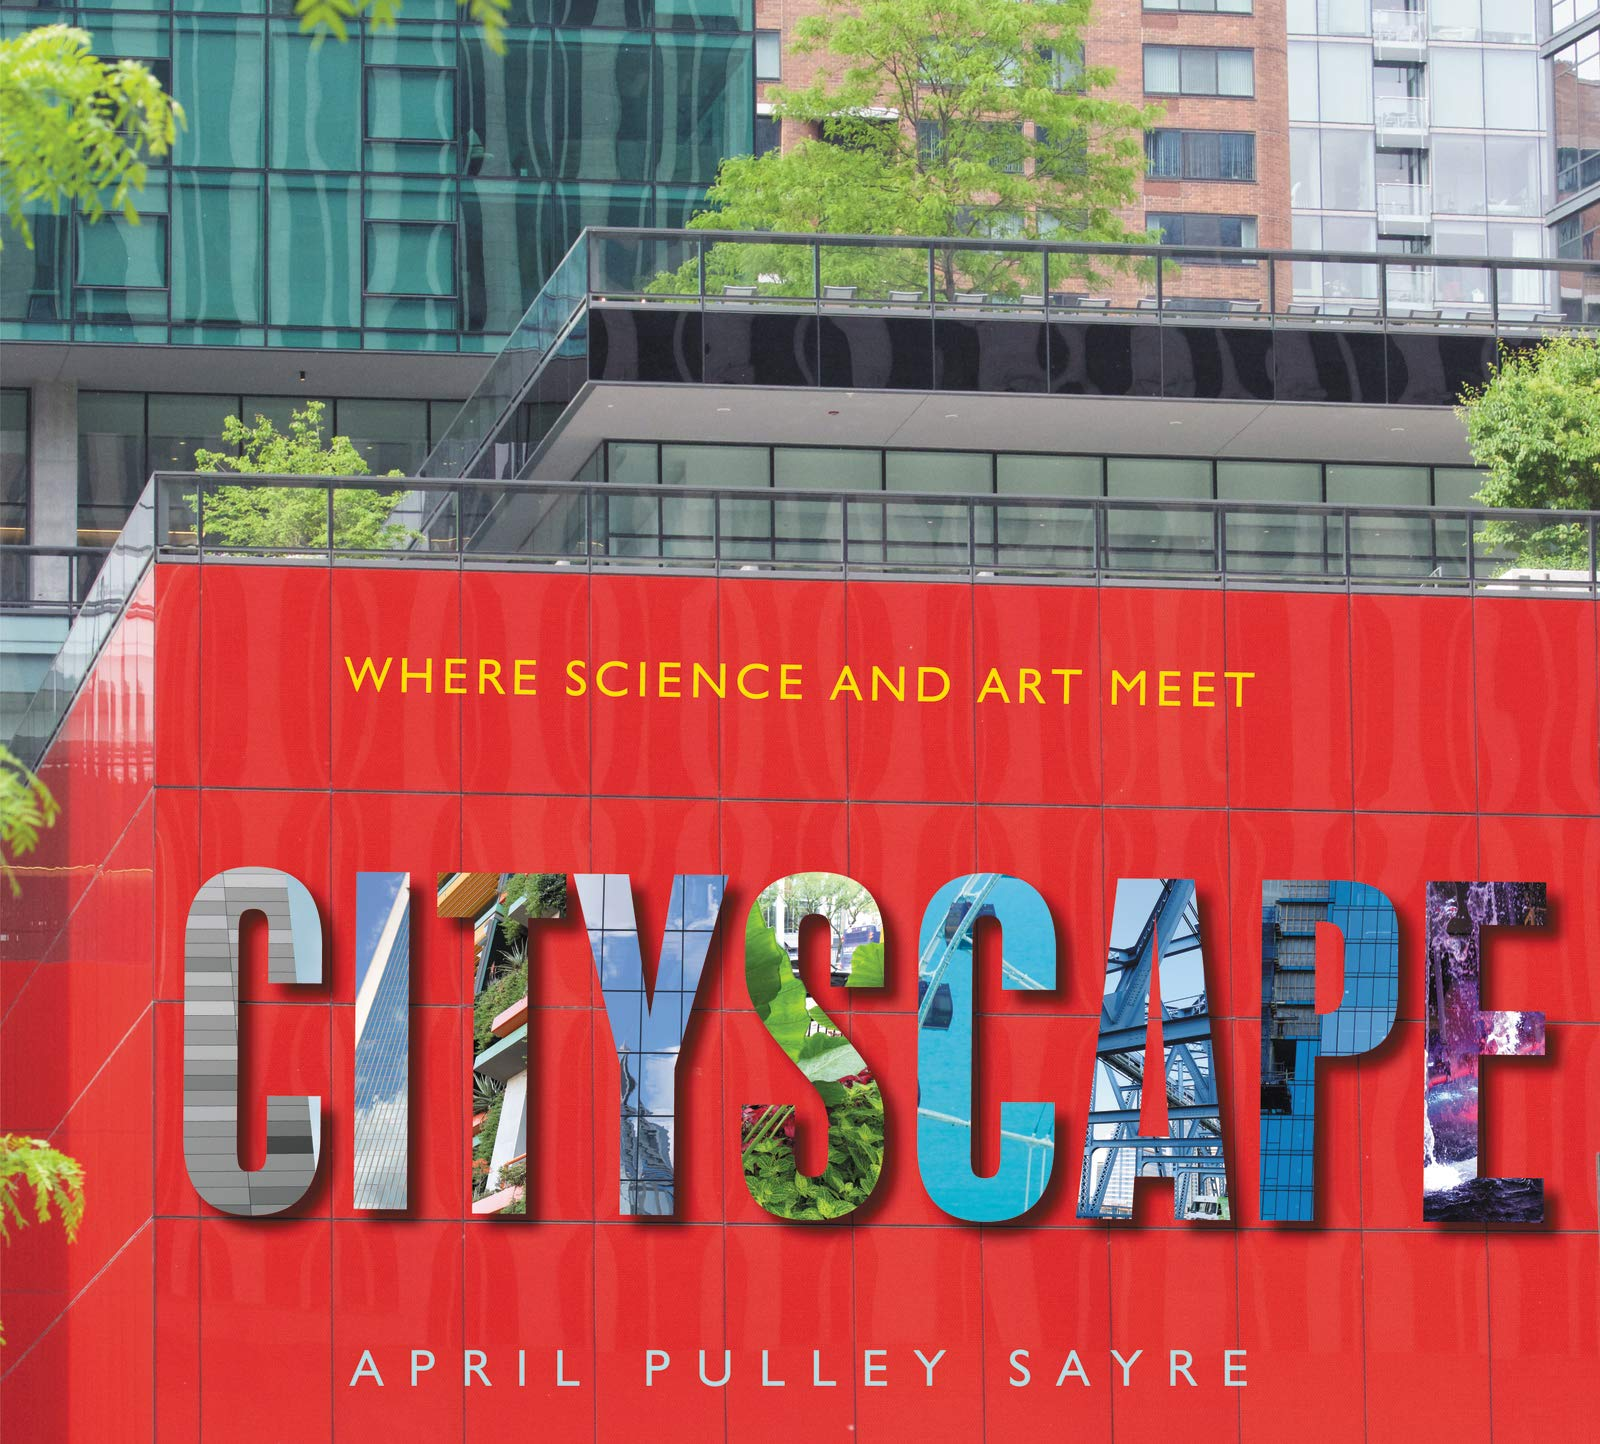 Amazon.com: Cityscape: Where Science and Art Meet (9780062893314 ...